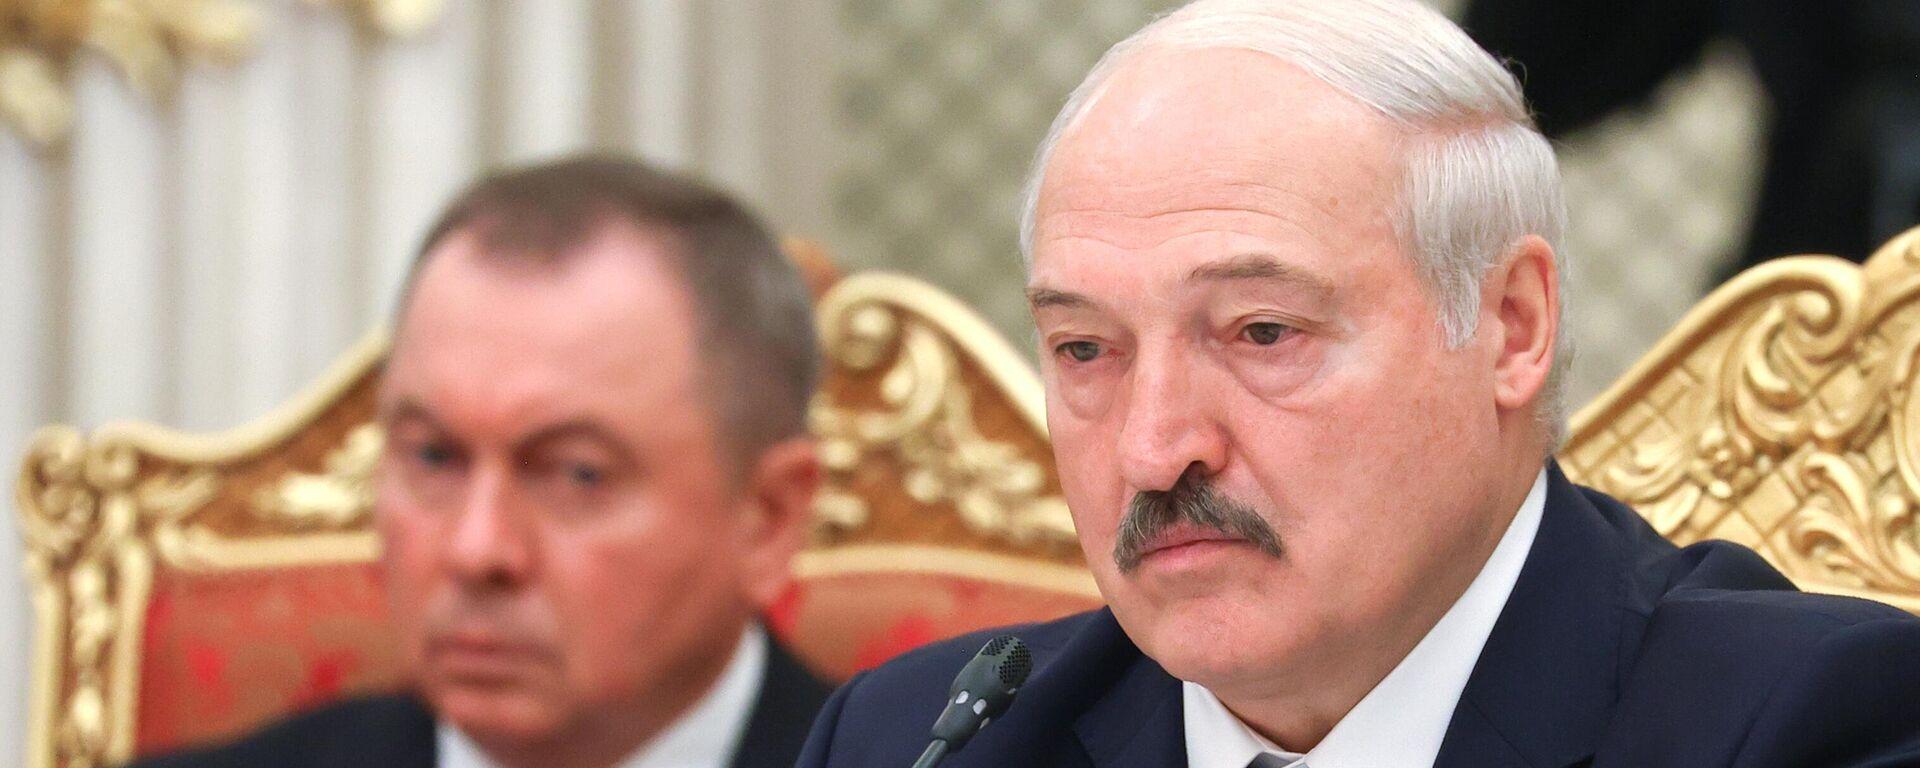 Президент Белоруссии Александр Лукашенко - Sputnik Тоҷикистон, 1920, 01.10.2021